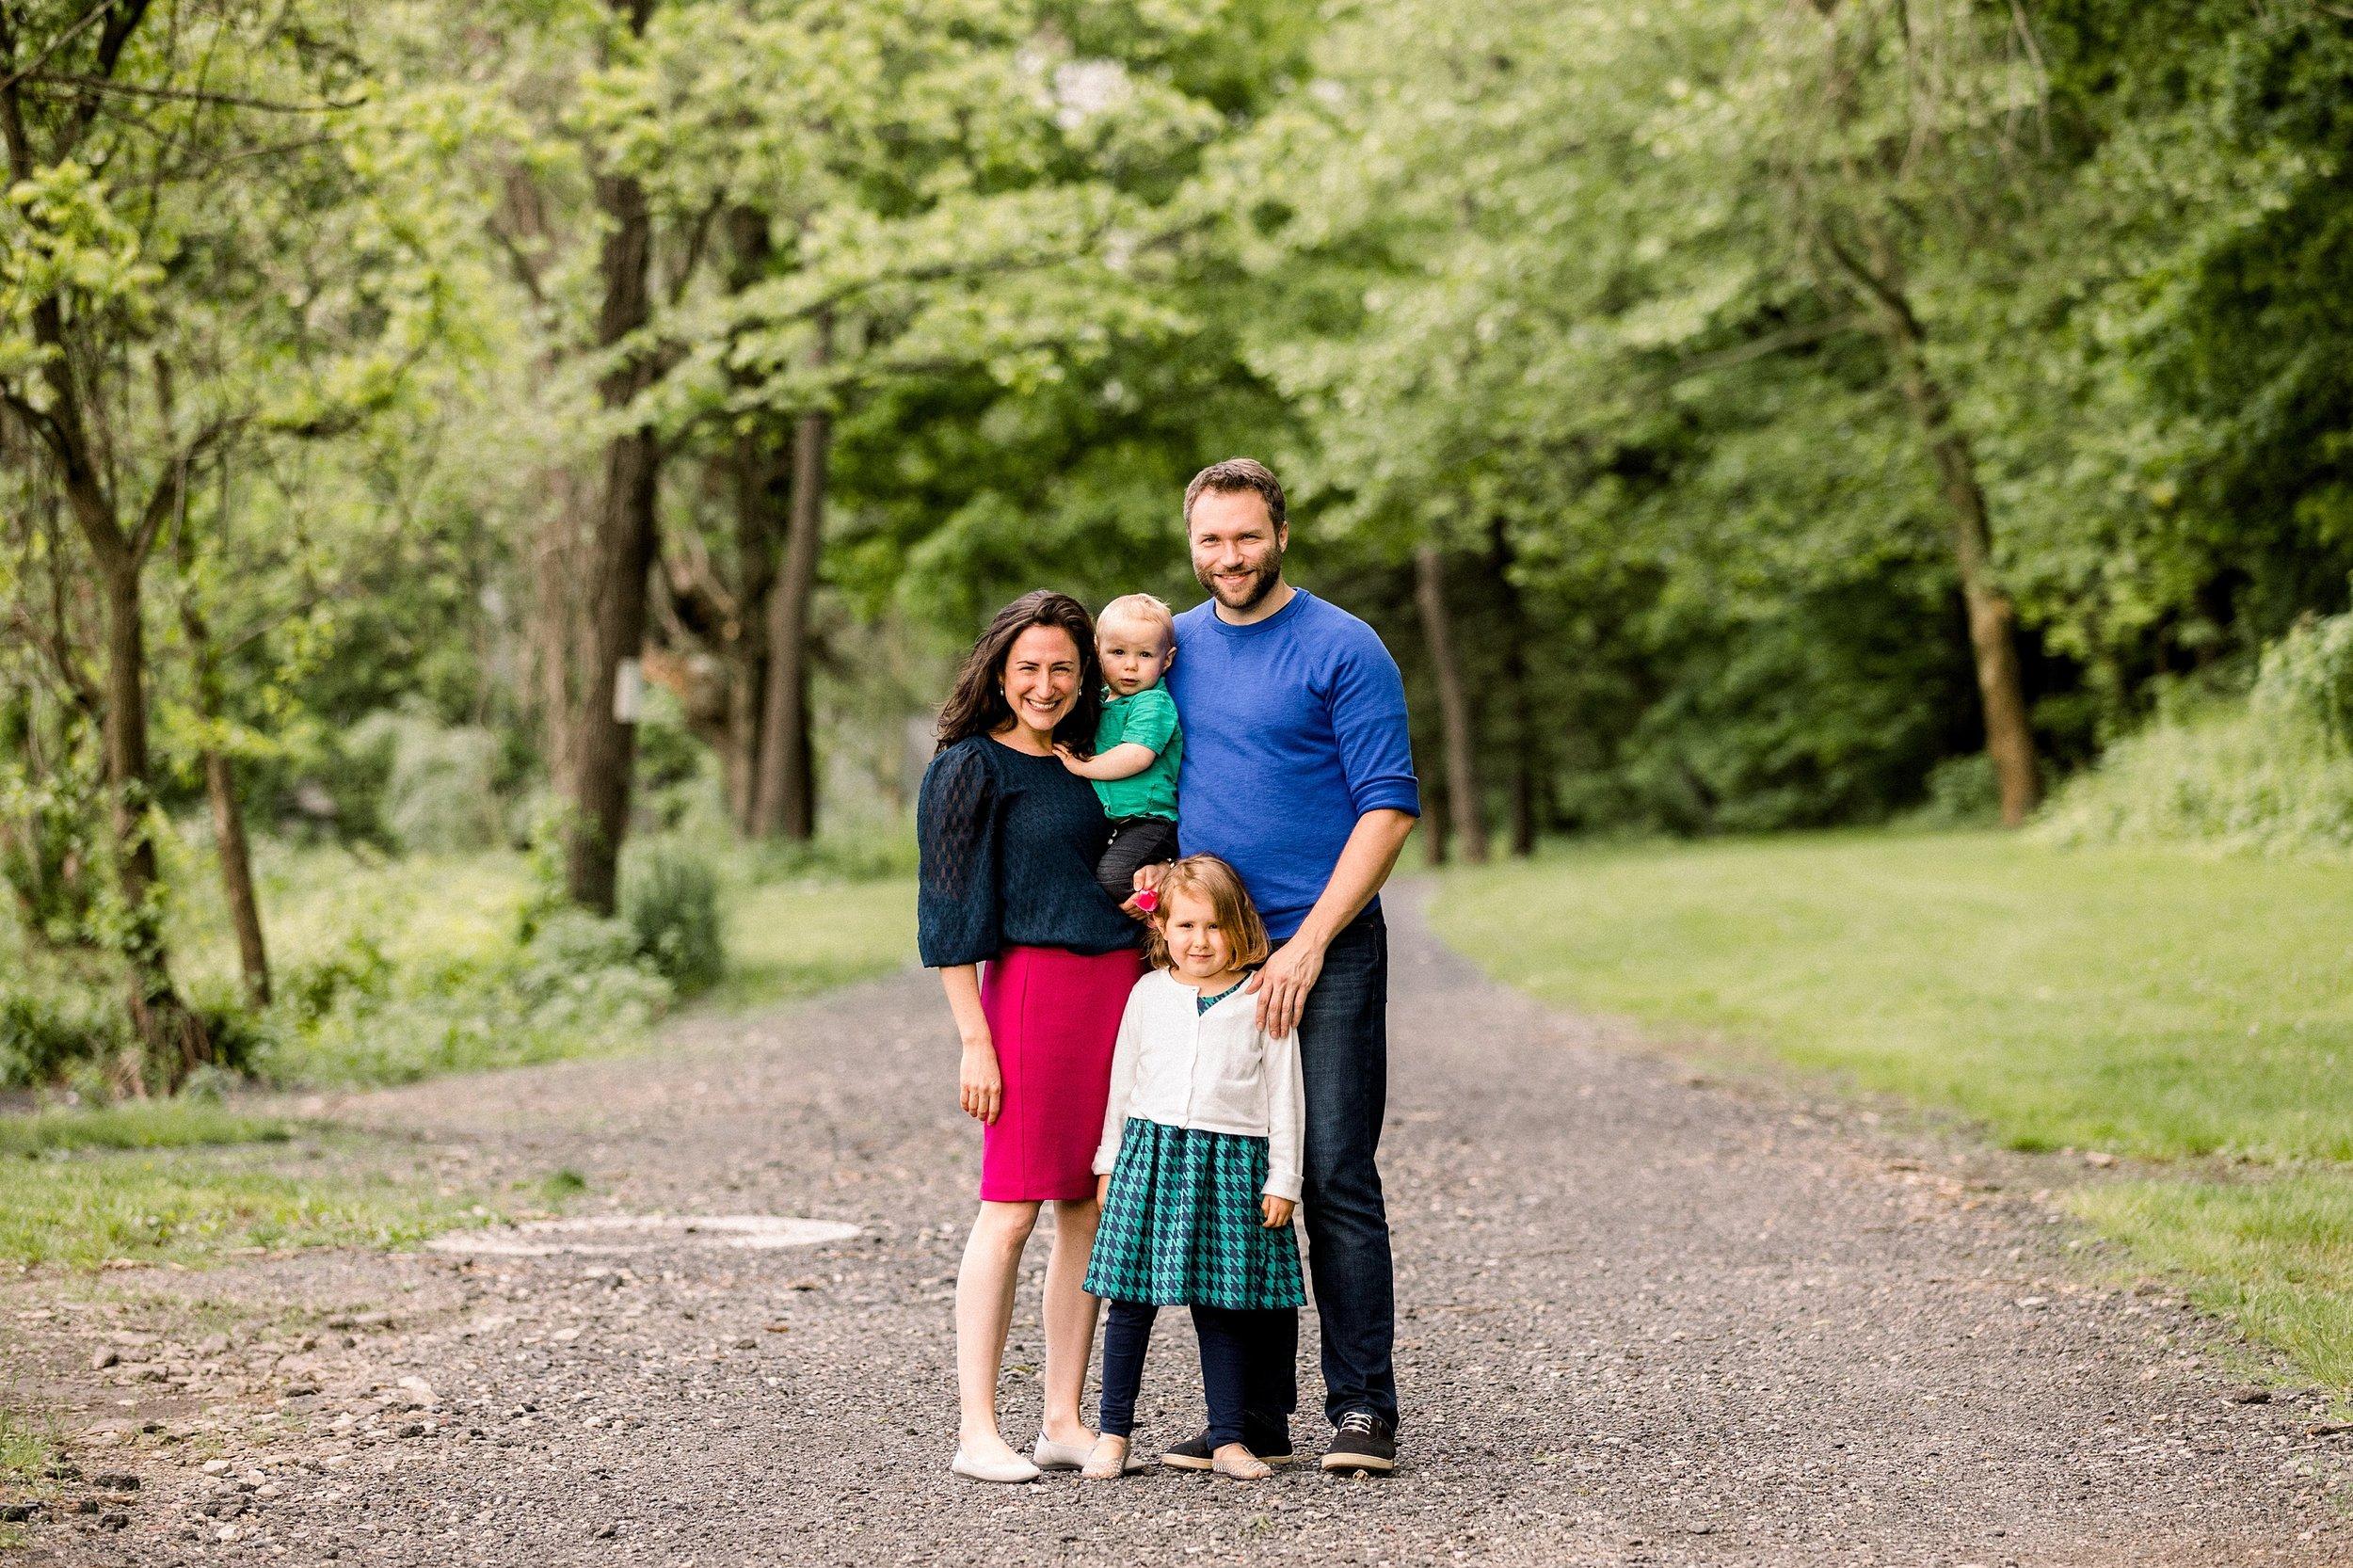 Lehigh-Valley-Family-Photographer_0021.jpg